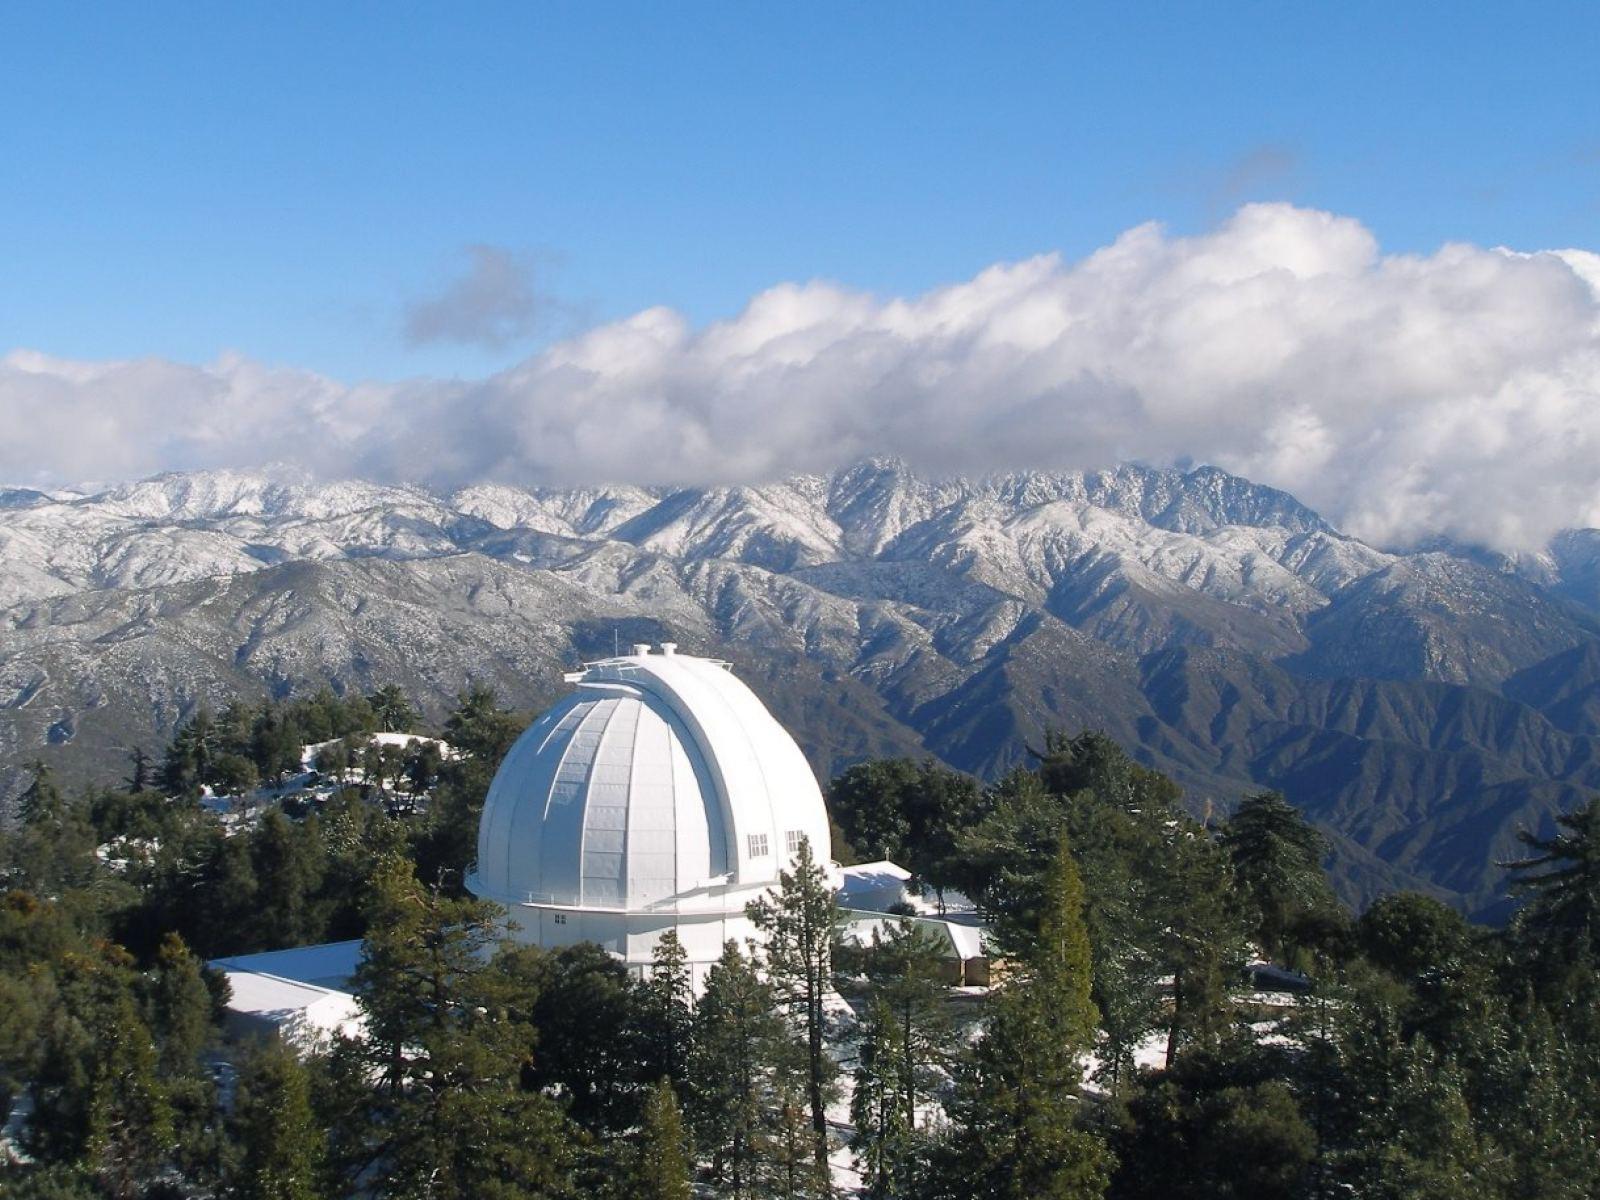 Mount Wilson Observatory 100-inch telescope